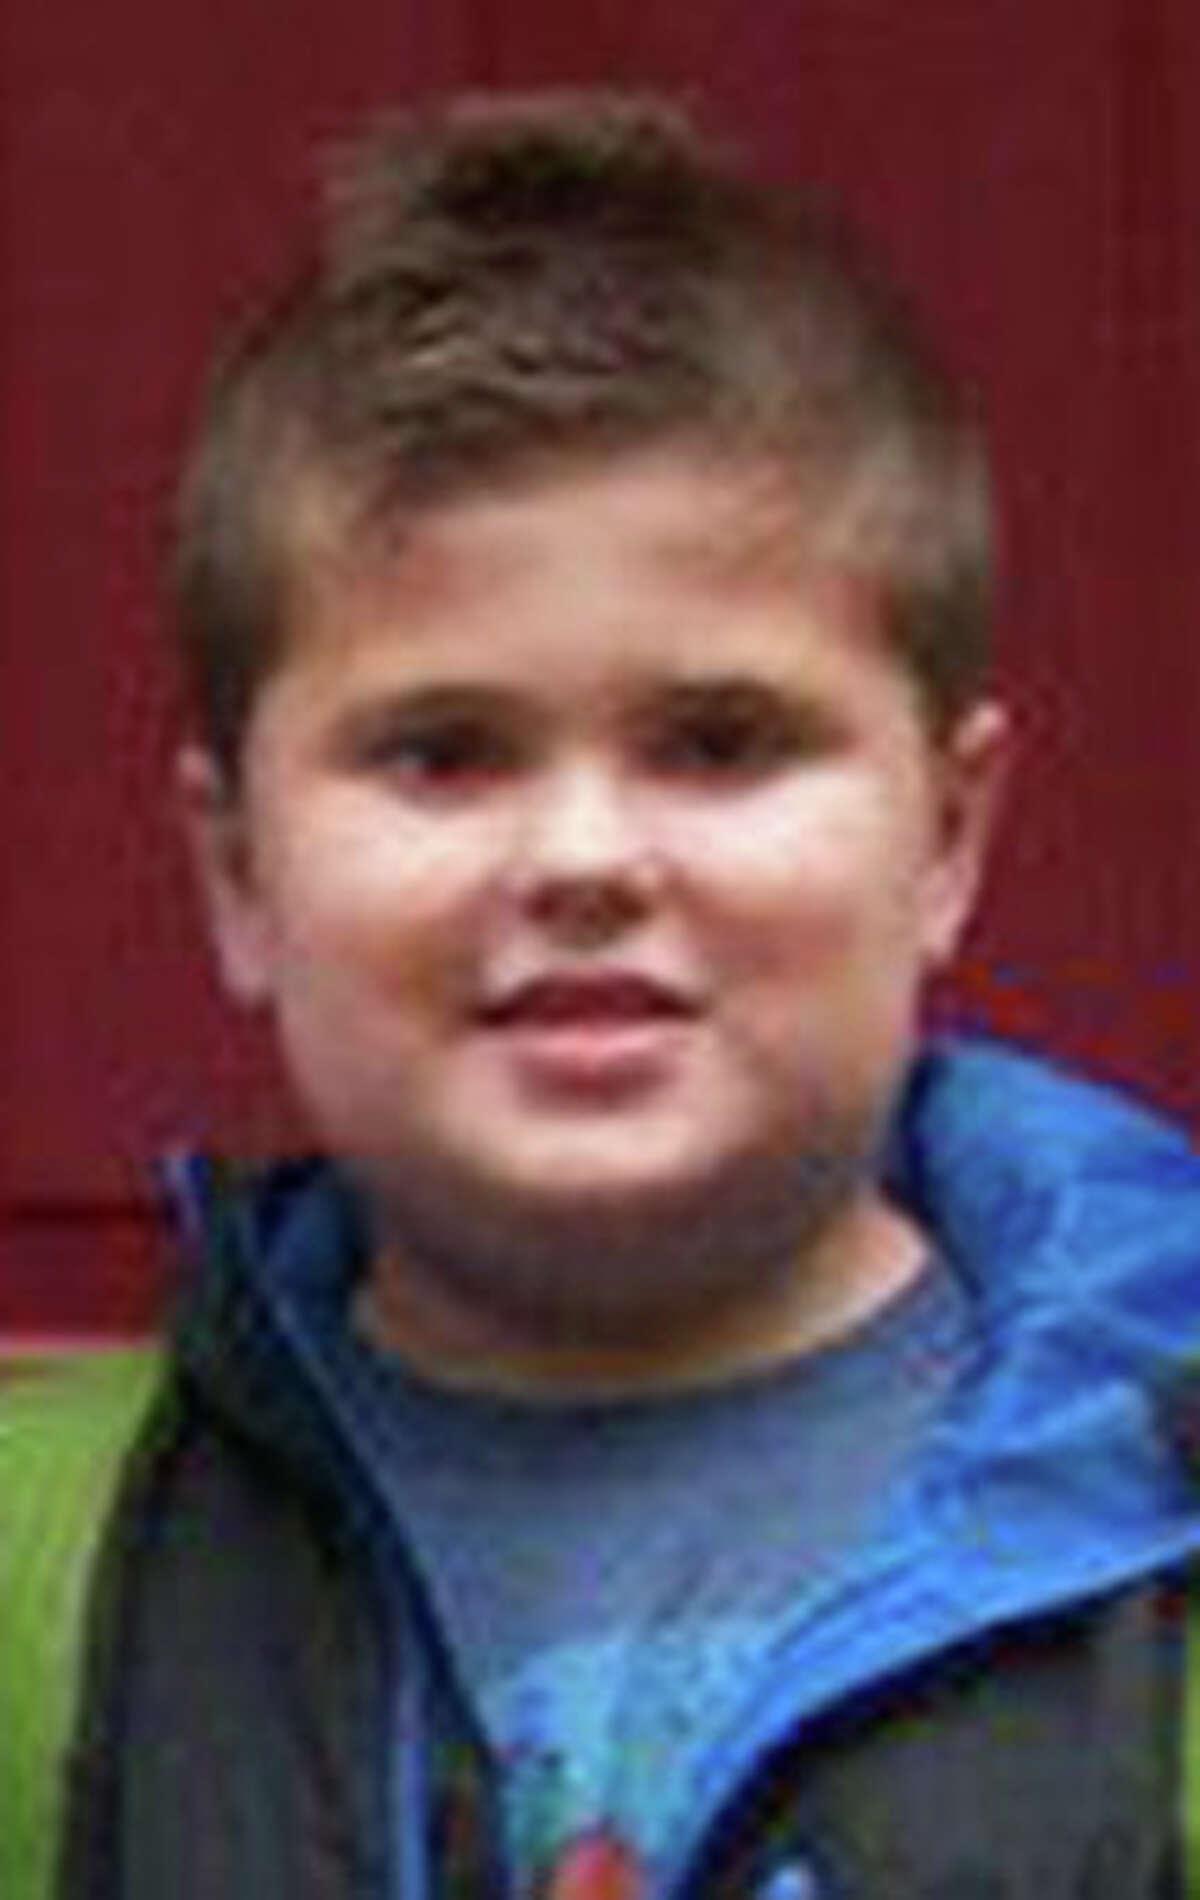 James Mattioli a victim in the Sandy Hook Elementary School shooting in Newtown, Conn. on Friday, Dec 14, 2012.